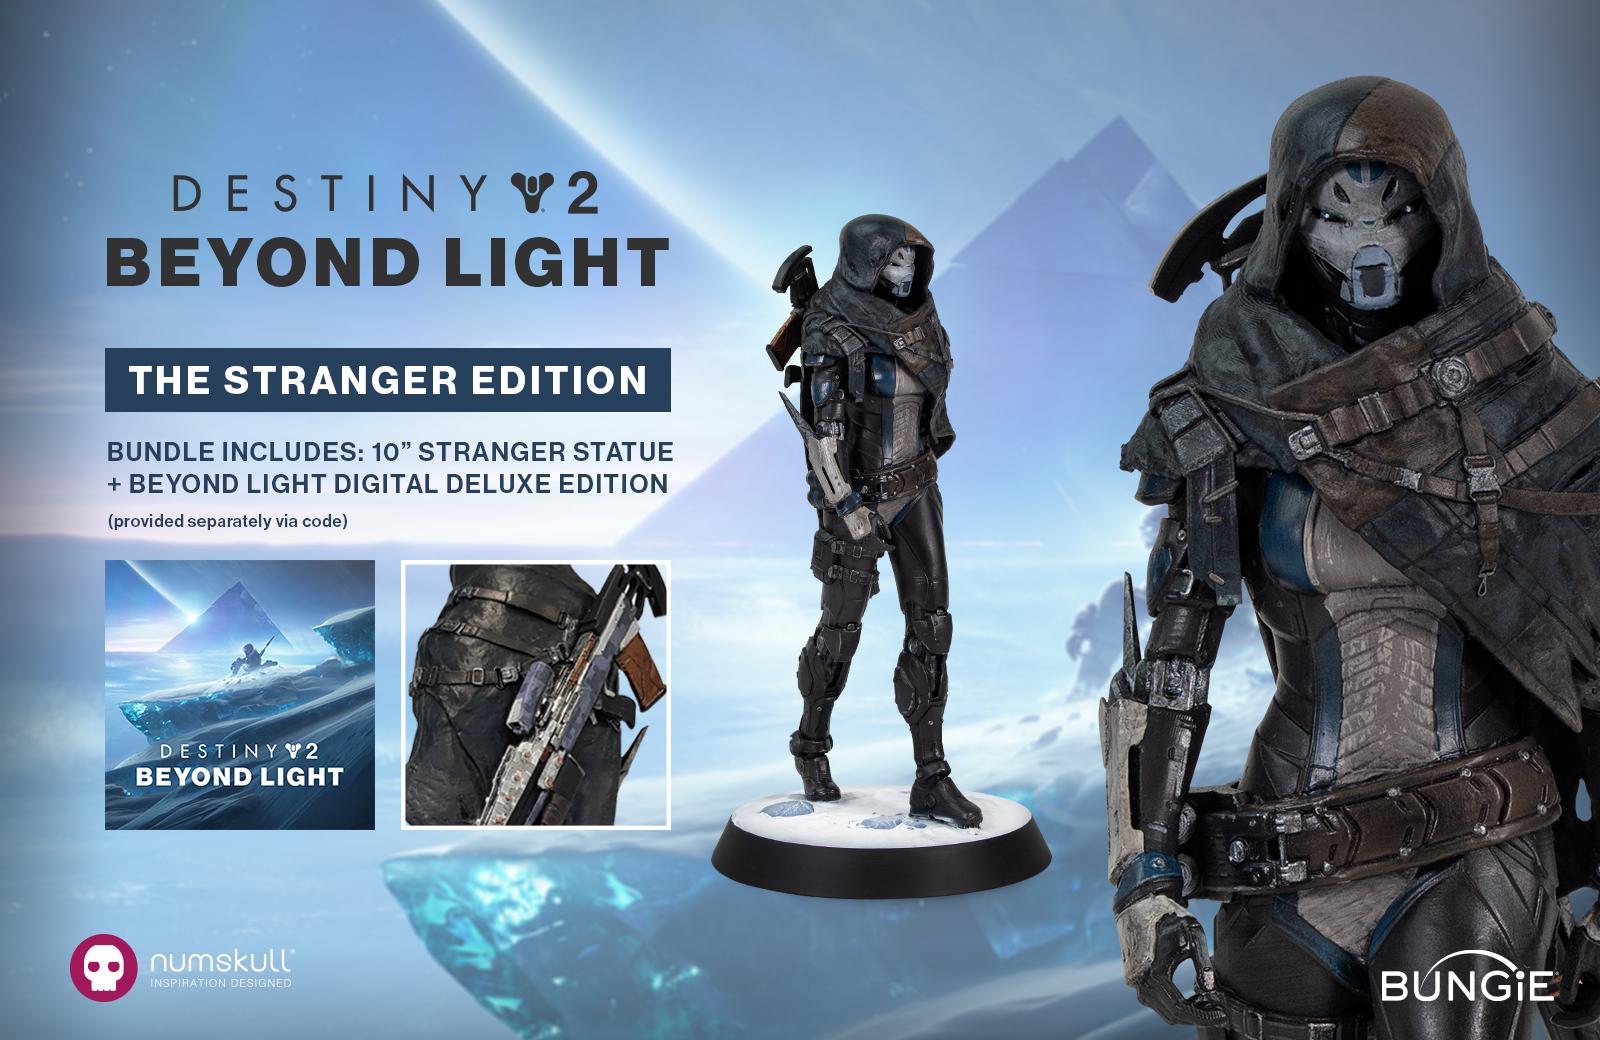 destiny 2 beyond light stranger edition